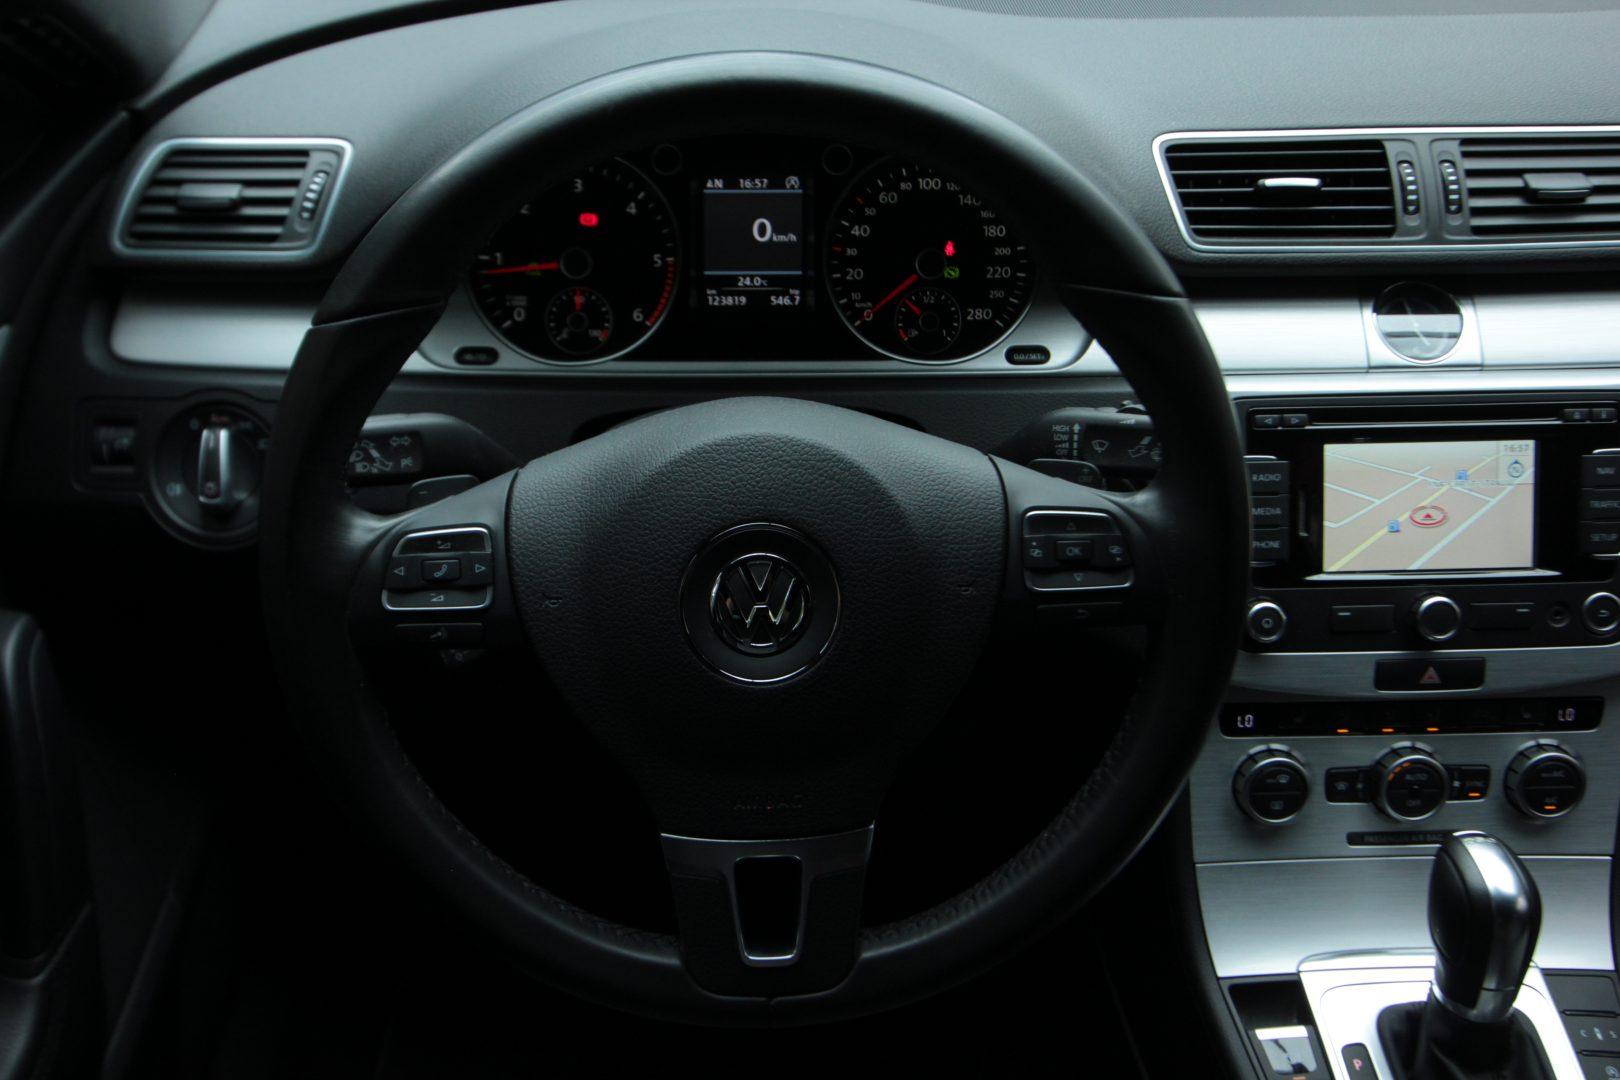 AIL VW CC 2.0TDI Basis BMT 4Motion DSG 3